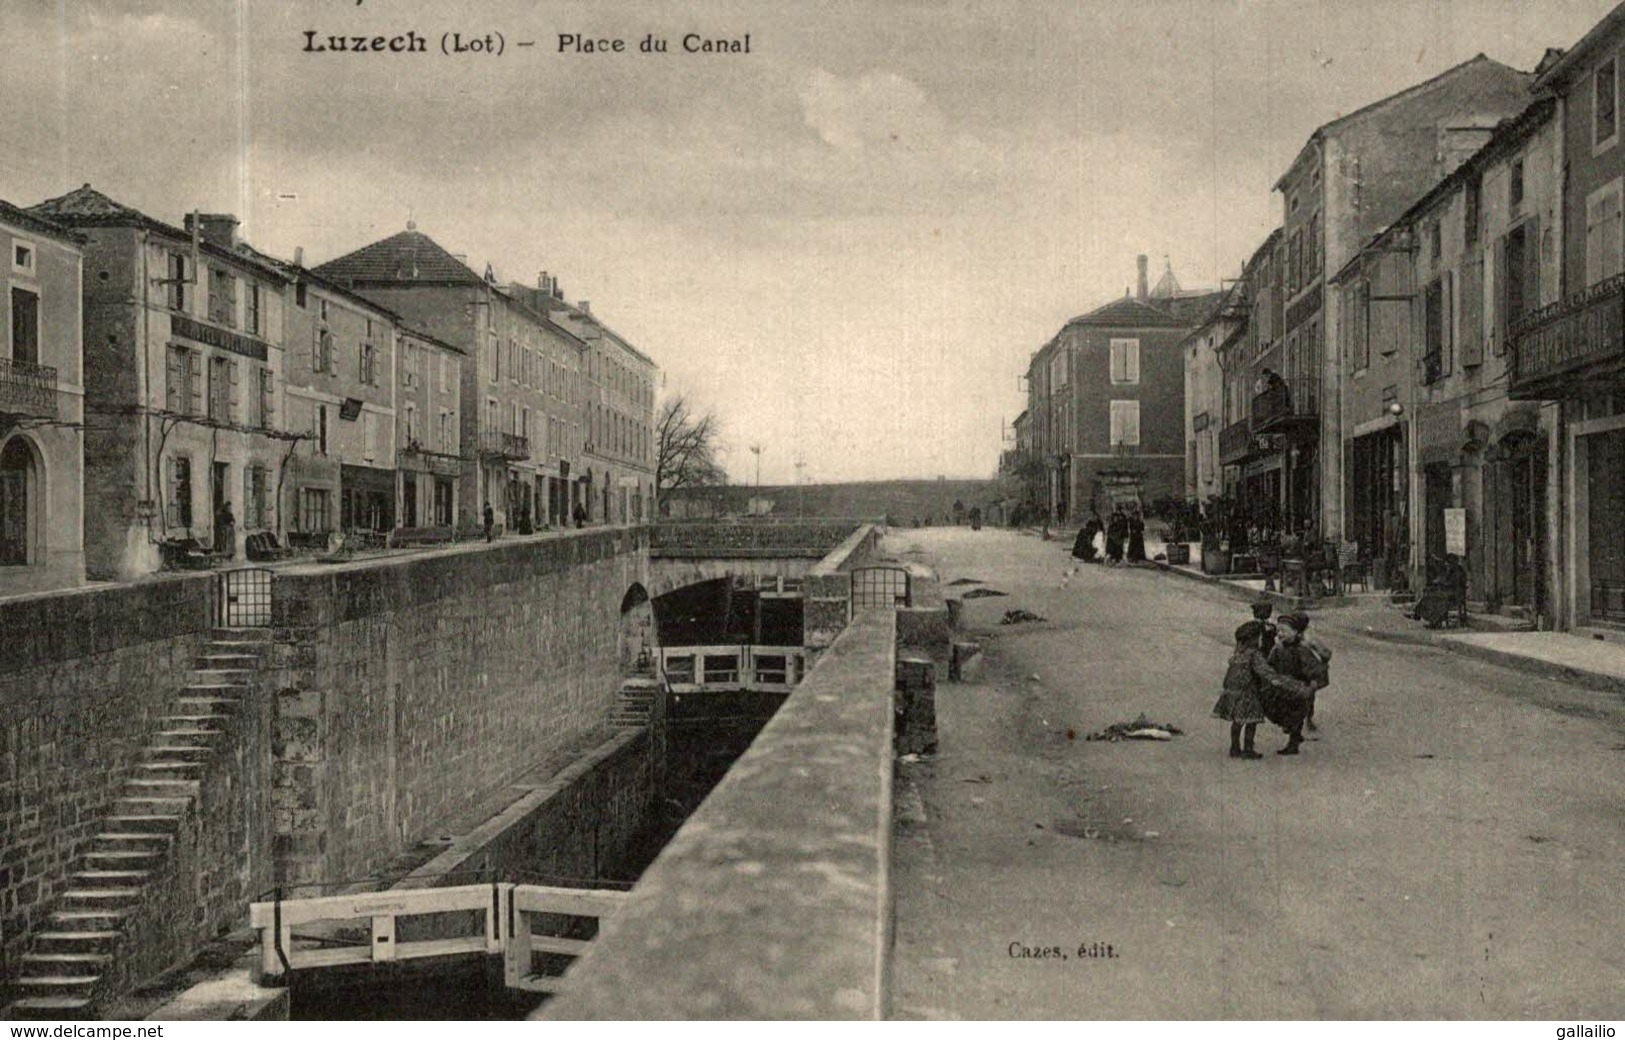 LUZECH PLACE DU CANAL - Luzech